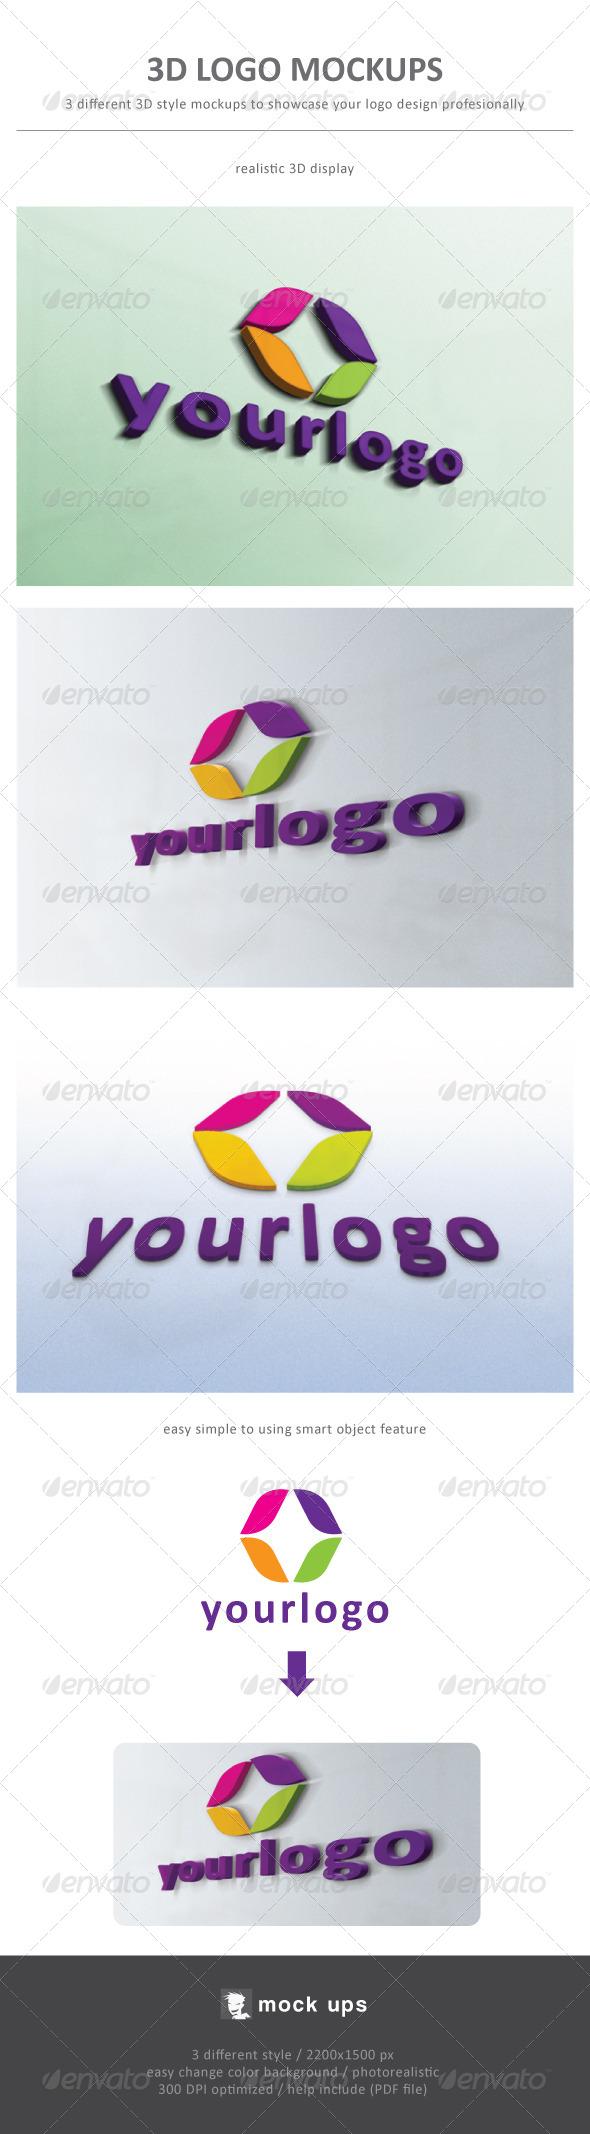 3D Logo Mockup - Logo Product Mock-Ups